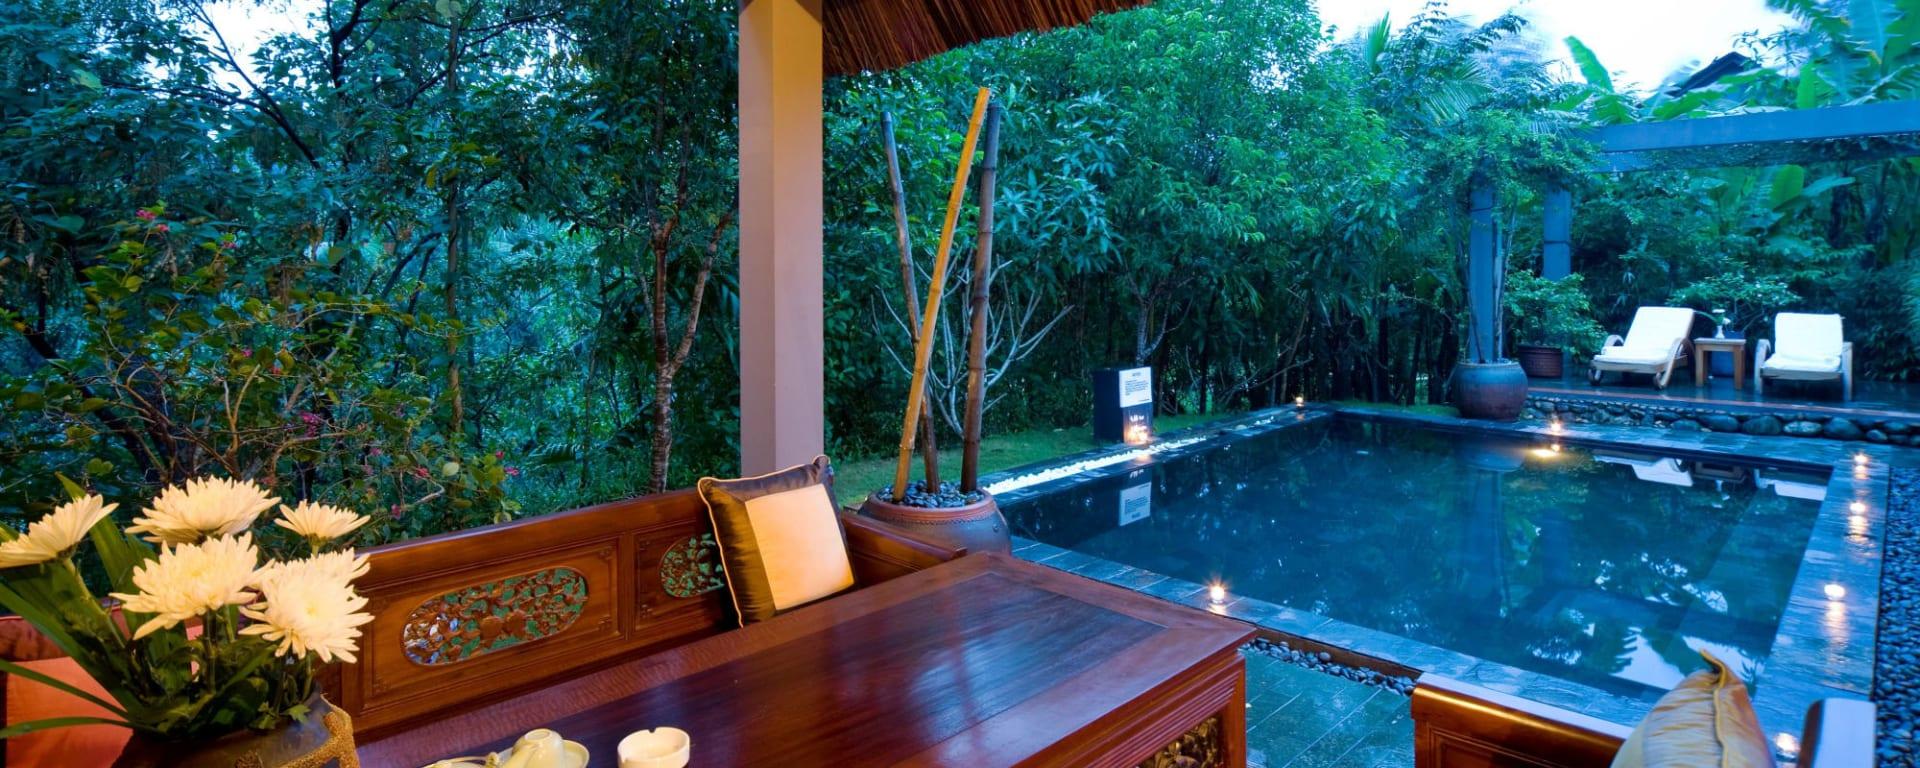 Pilgrimage Village in Hue: Vietnam Pilgrimage Village Pool House